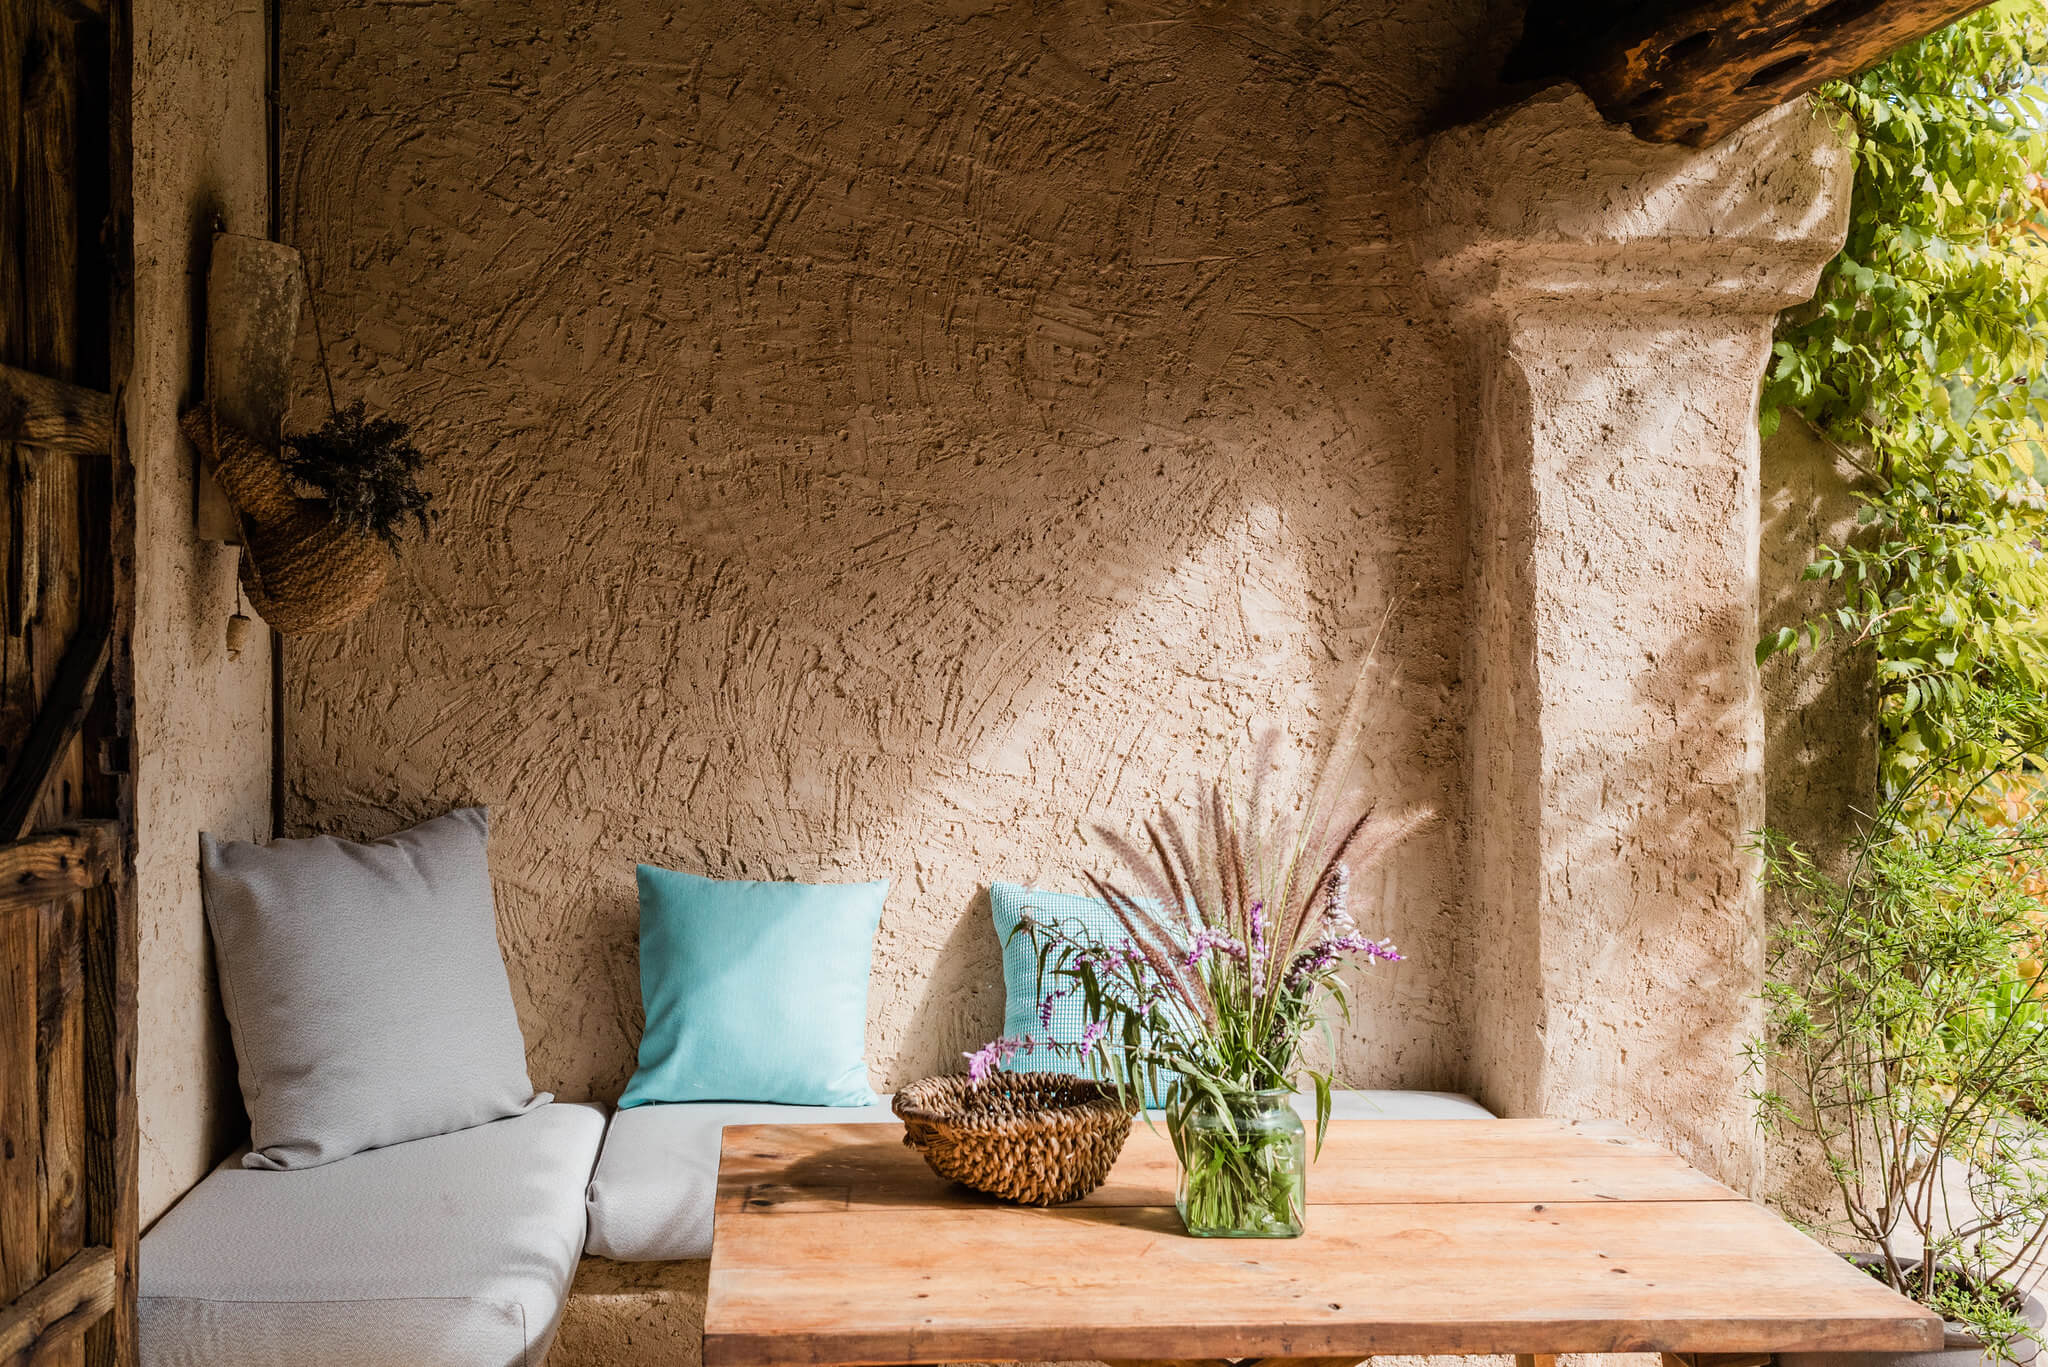 https://www.white-ibiza.com/wp-content/uploads/2020/05/white-ibiza-villas-can-sabina-exterior-shaded-terrace.jpg